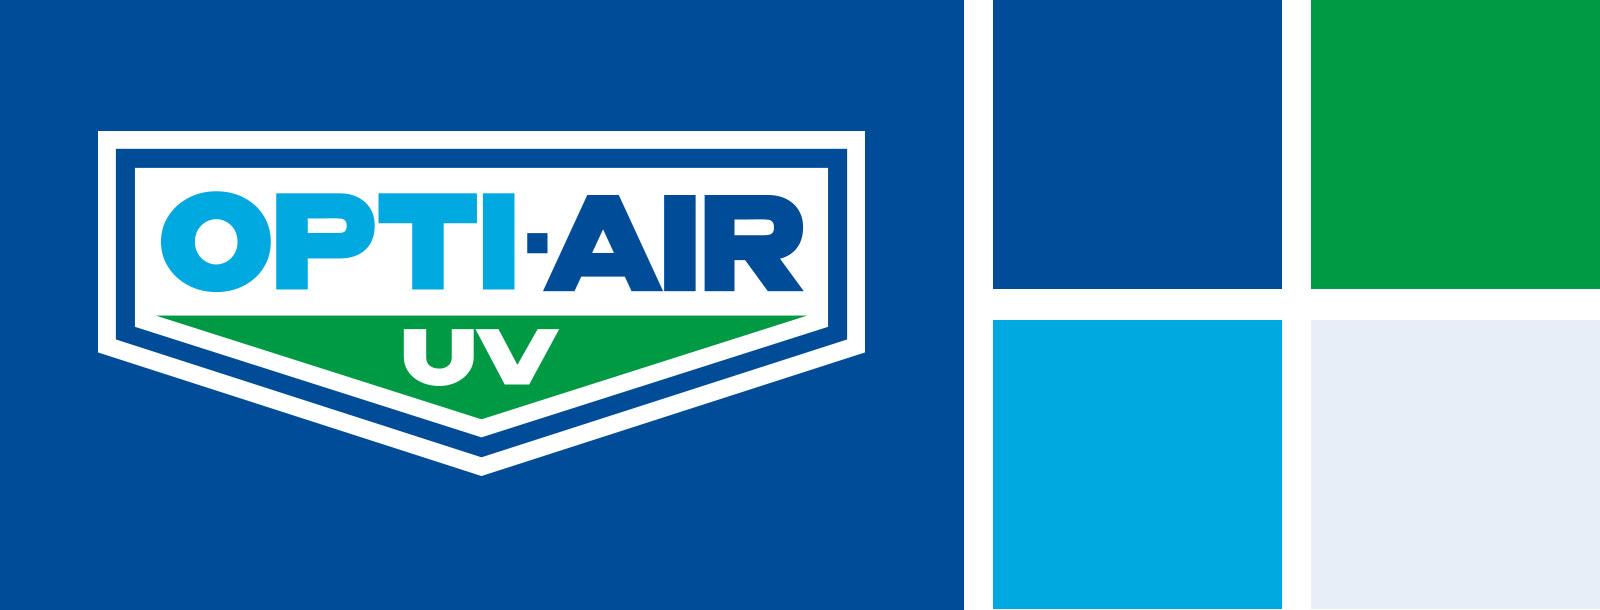 Opti-Air UV design and branding